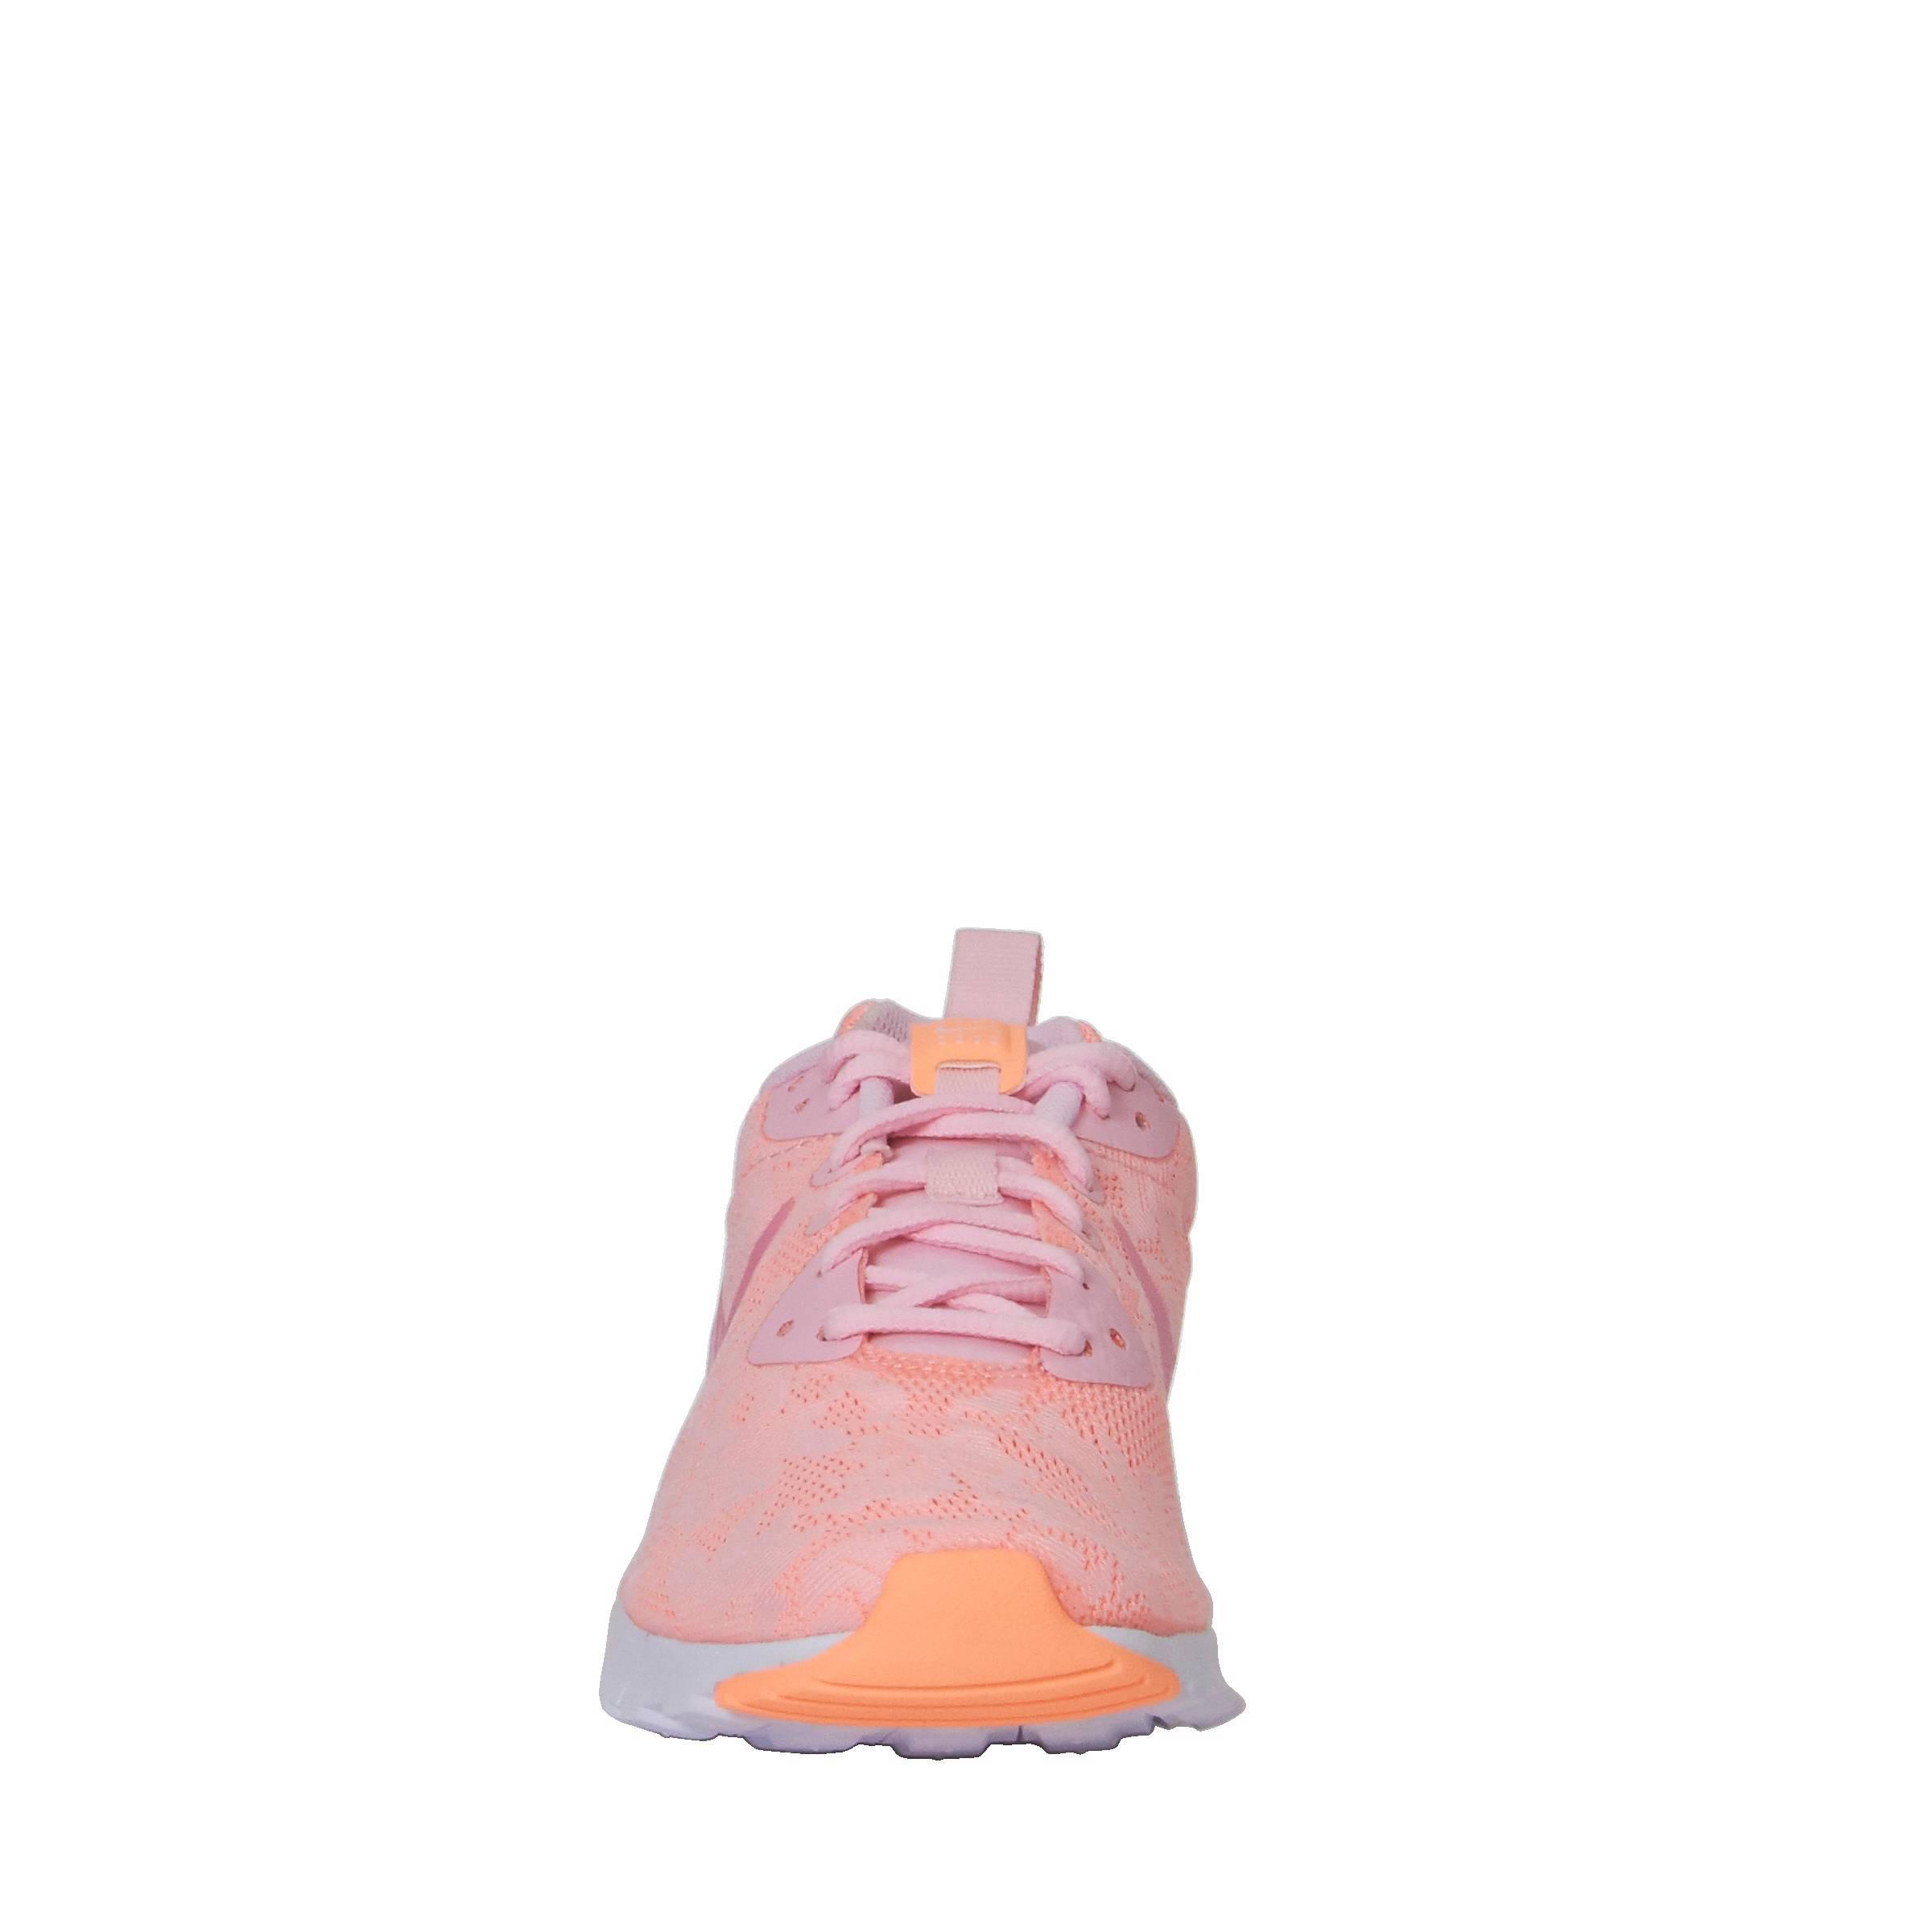 Nike Air Max Motion LW ENG sneakers UtpvklPb | nike | Dames